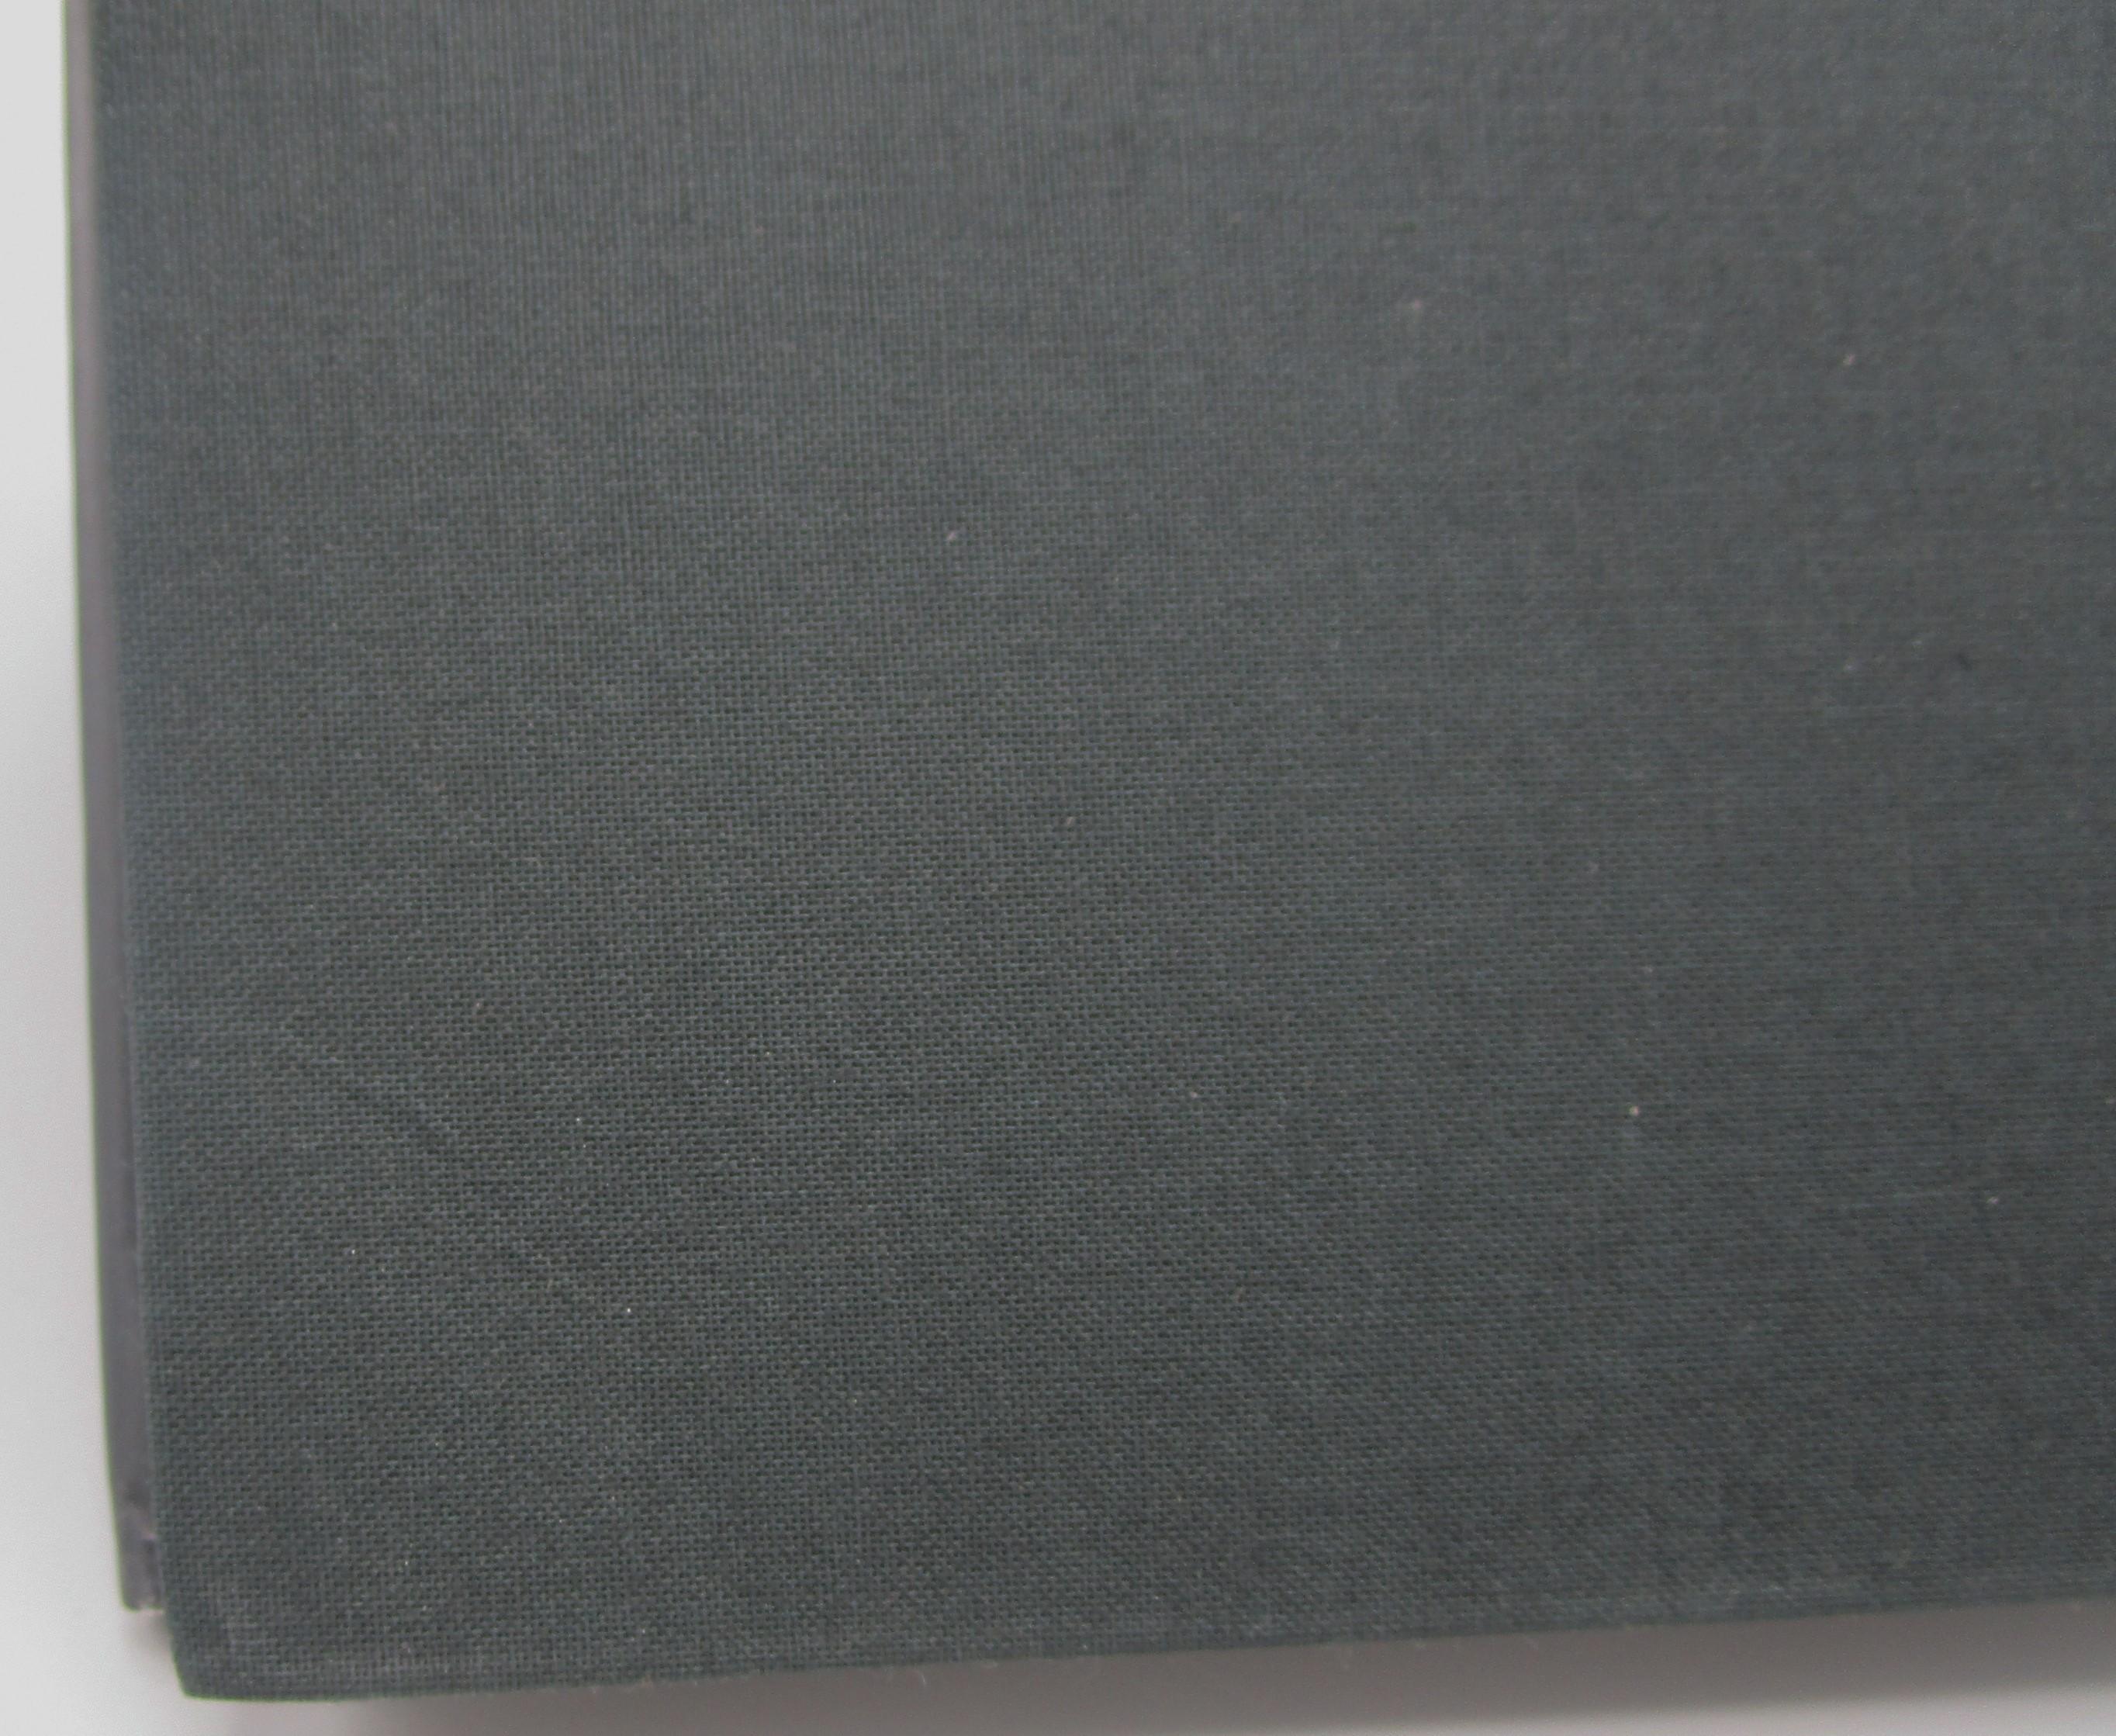 NAKED STEEL, by Gunter Blum - 1999 [Ltd 1st Ed]